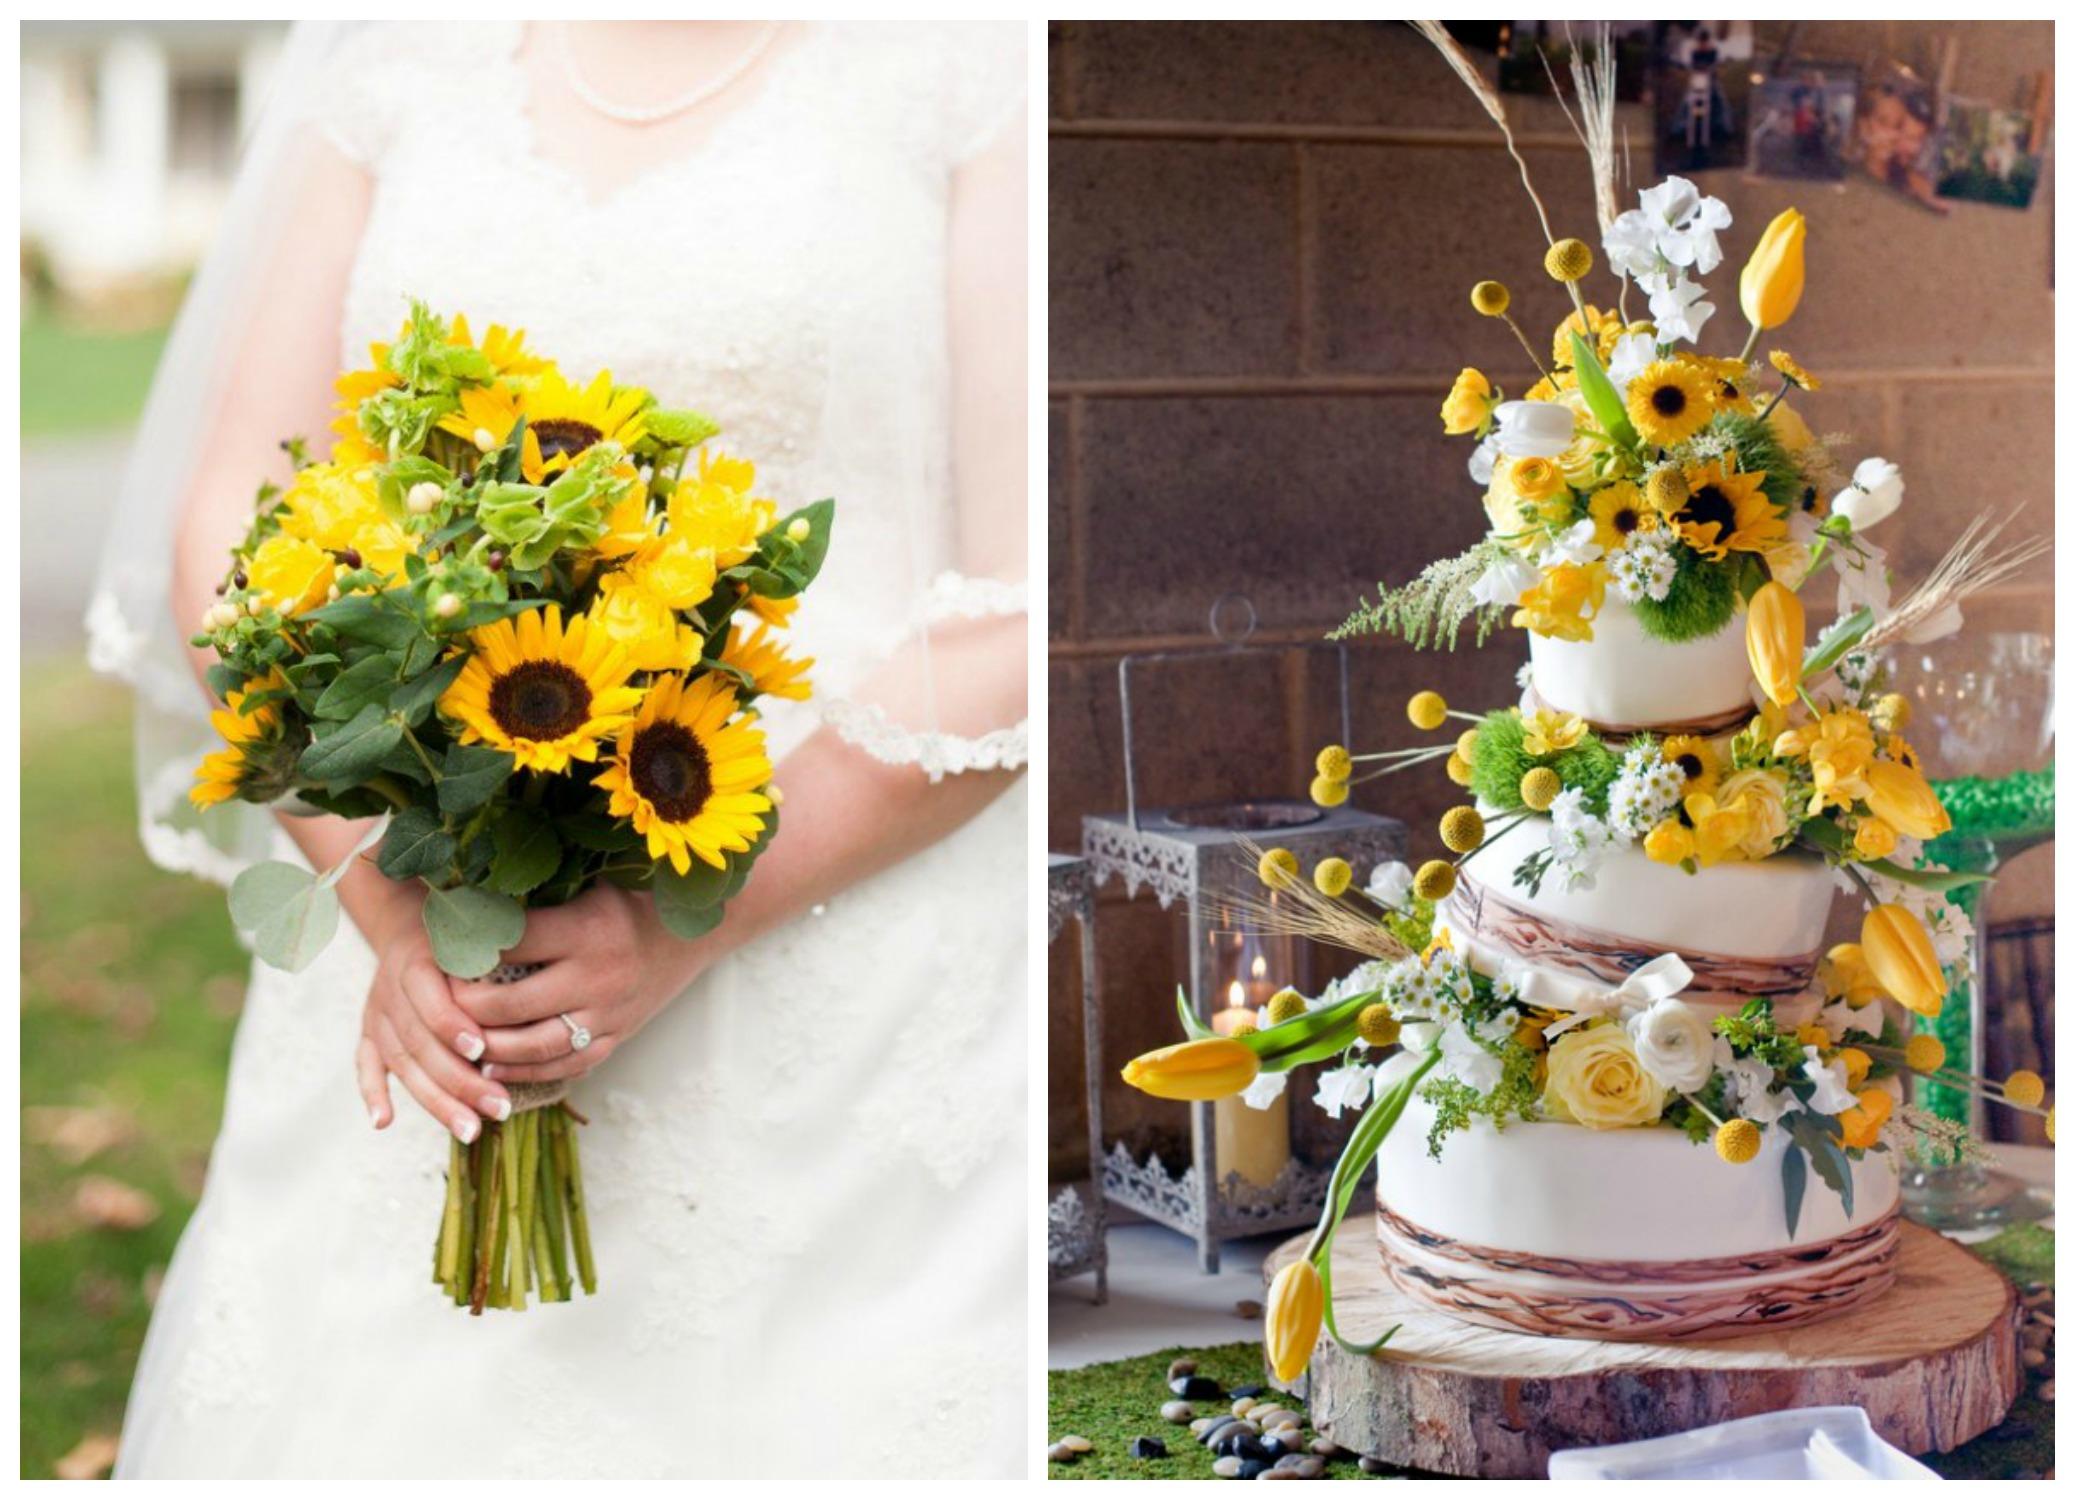 Pin Yellow Sunflower Wedding Cake Adventures In Cakes Cake